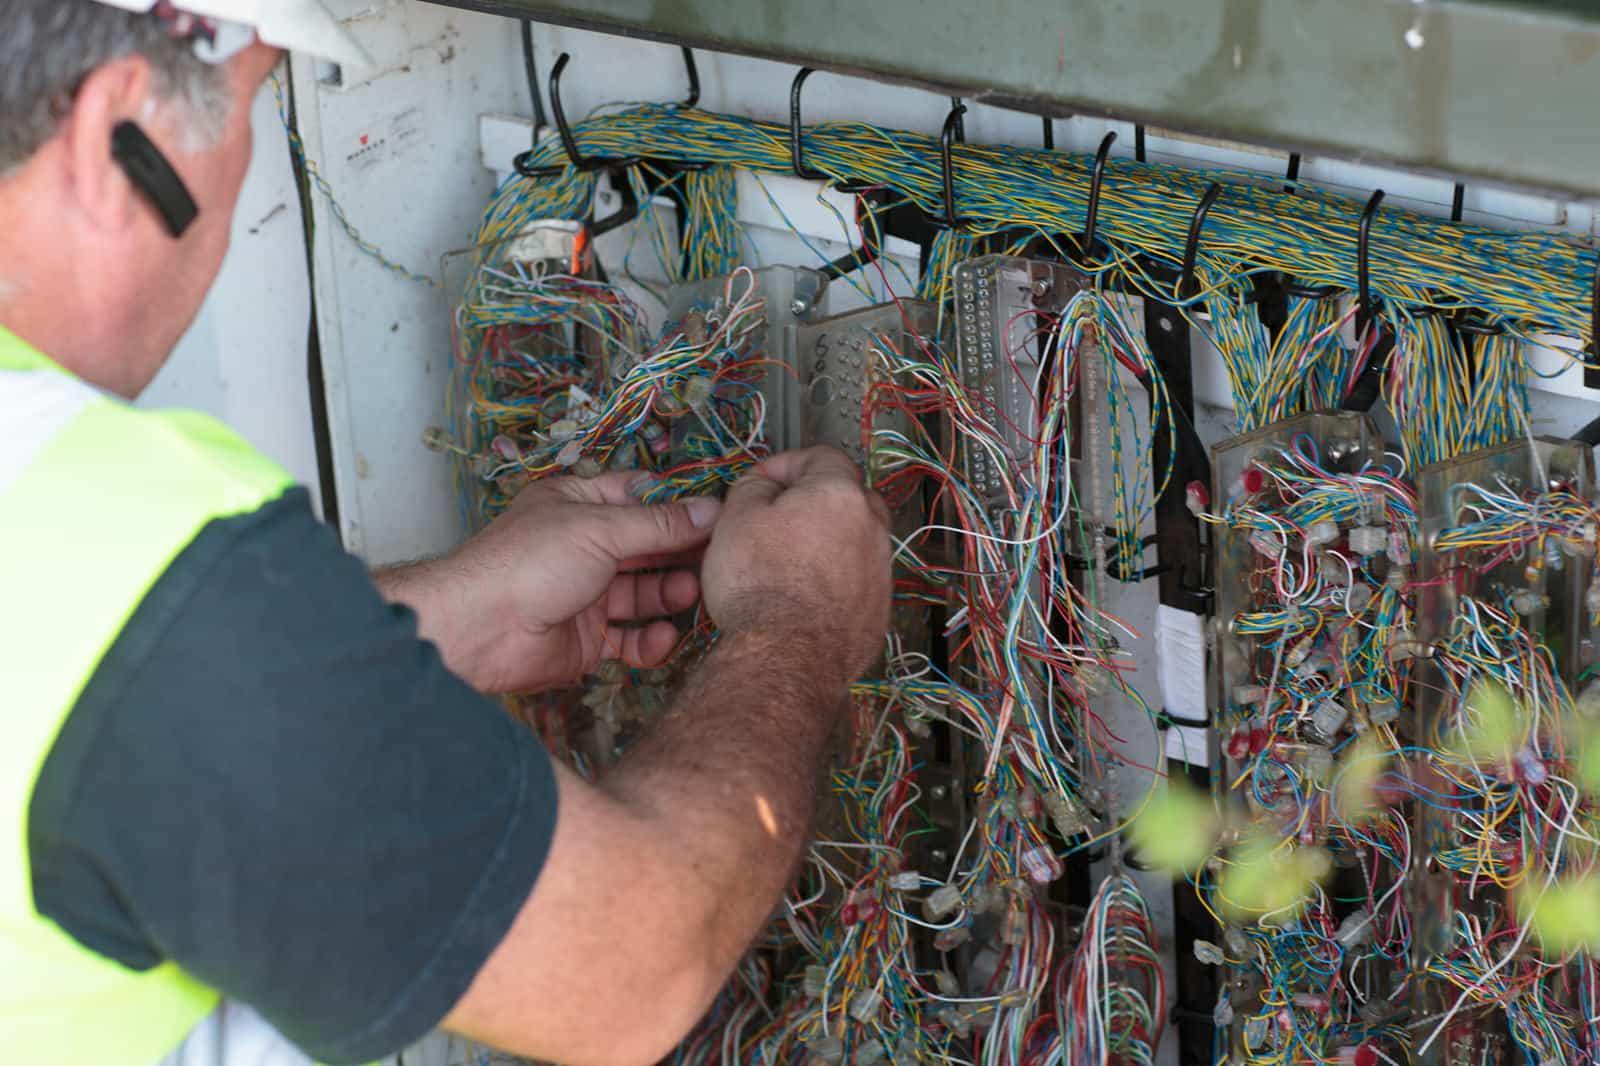 Vdsl2 Vectoring Crosstalk Crisis Increase Broadband Speed Vdsl Wiring Diagram First Connection